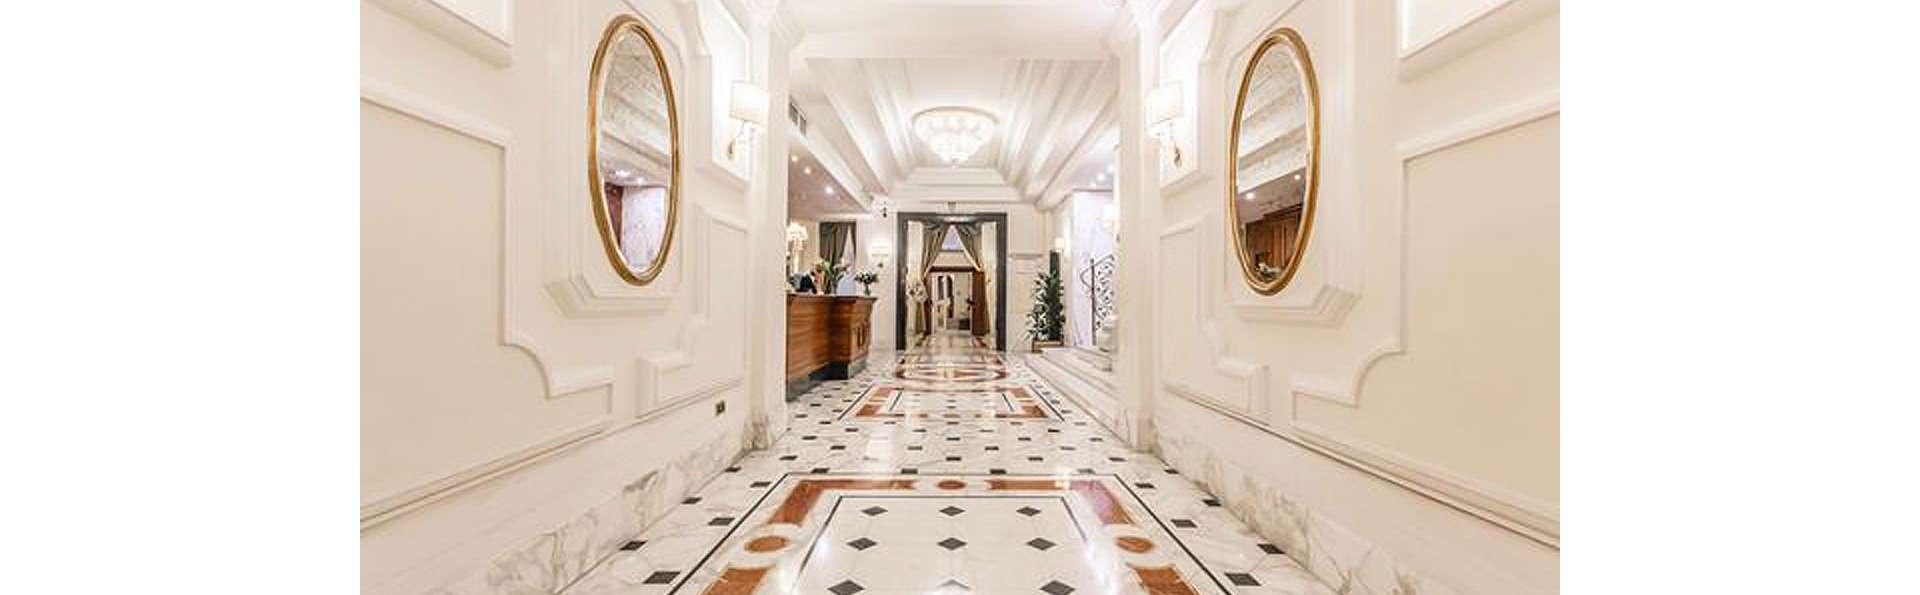 Raeli Hotel Archimede - EDIT_HALL_02.jpg